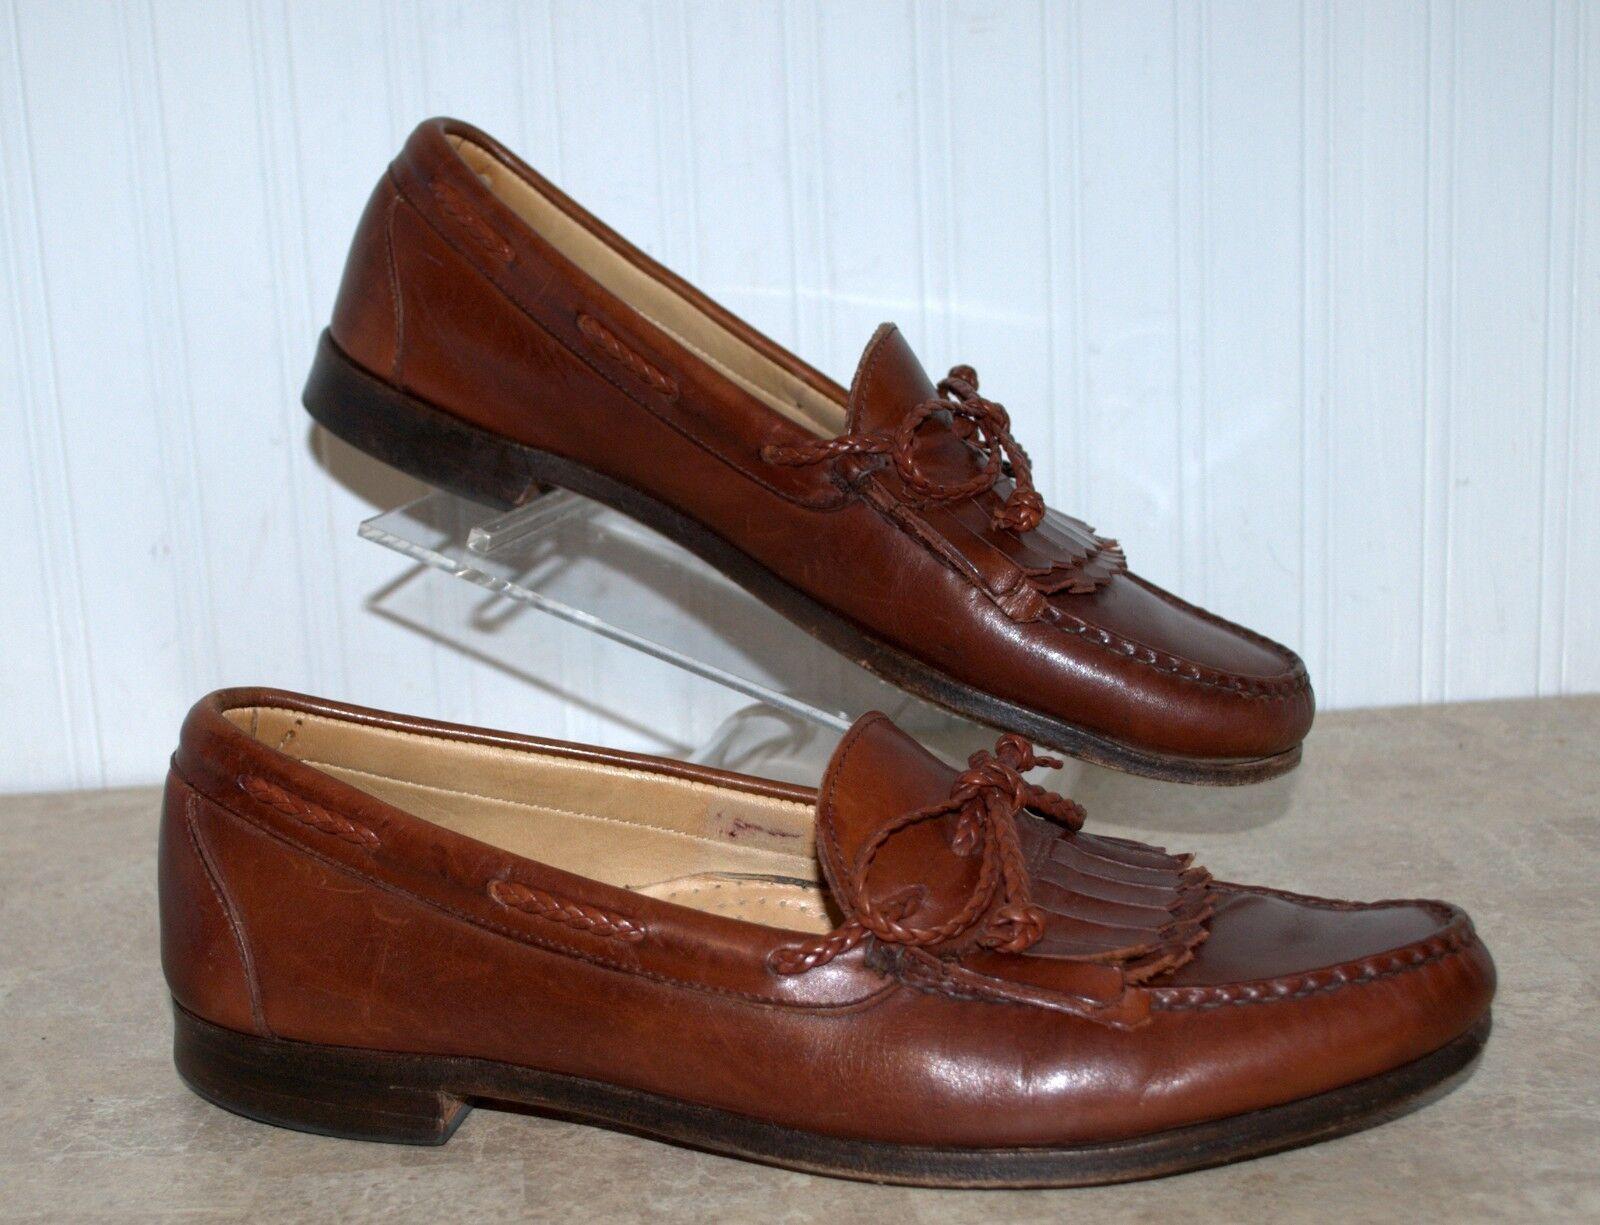 Allen Edmonds Woodstock Woodstock Woodstock 11.5 B Mans Shoes Loafer Chili Brown Pelle Kilt Top 671247